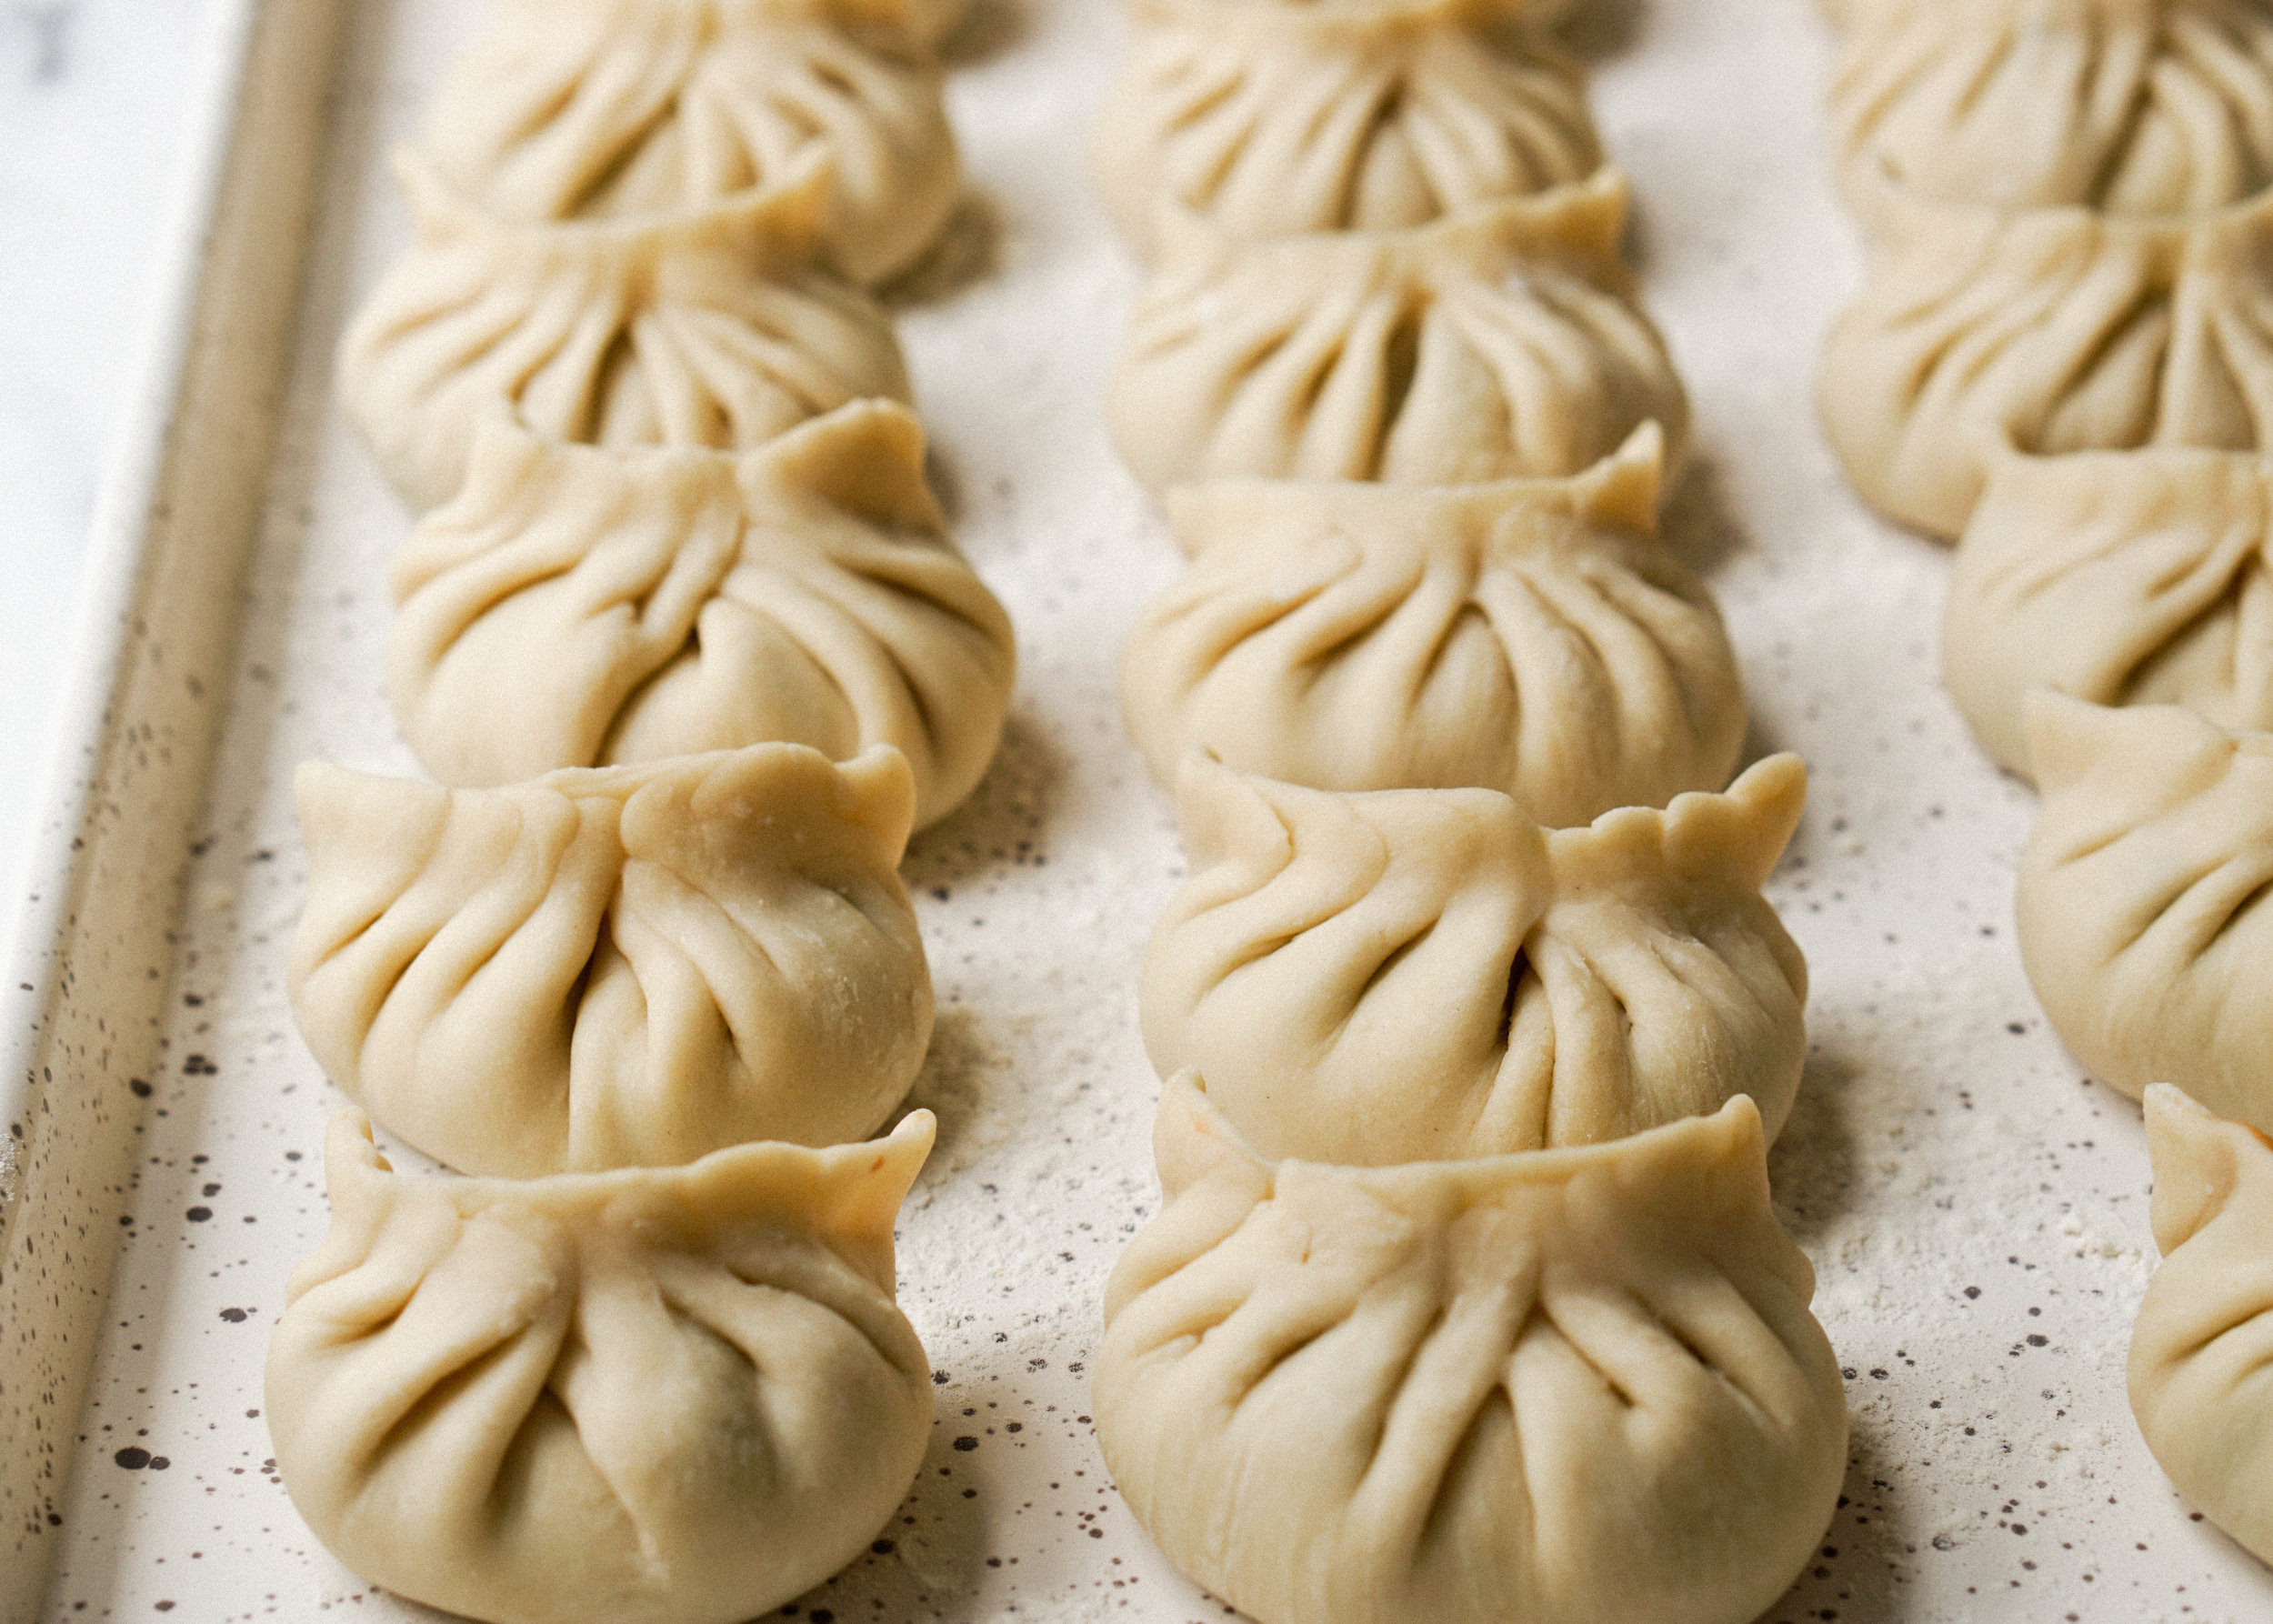 Dumpling Workshop Class - Eat Cho Food